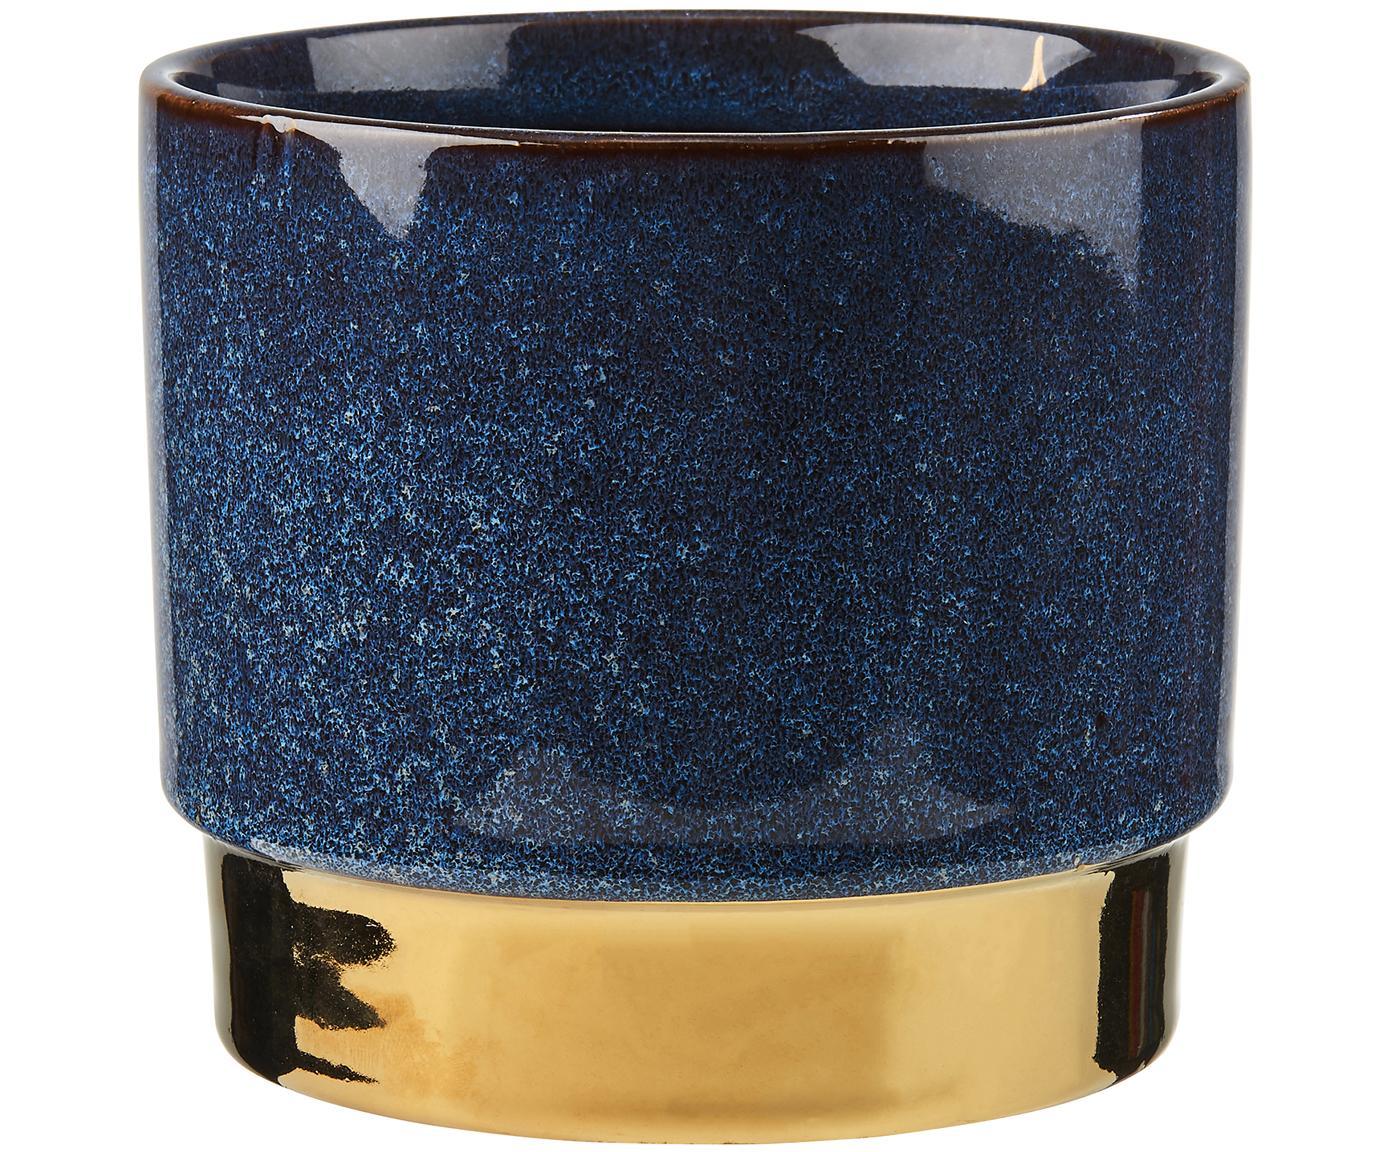 Portavaso Golden Touch, Gres, Blu, dorato, Ø 15 x Alt. 13 cm